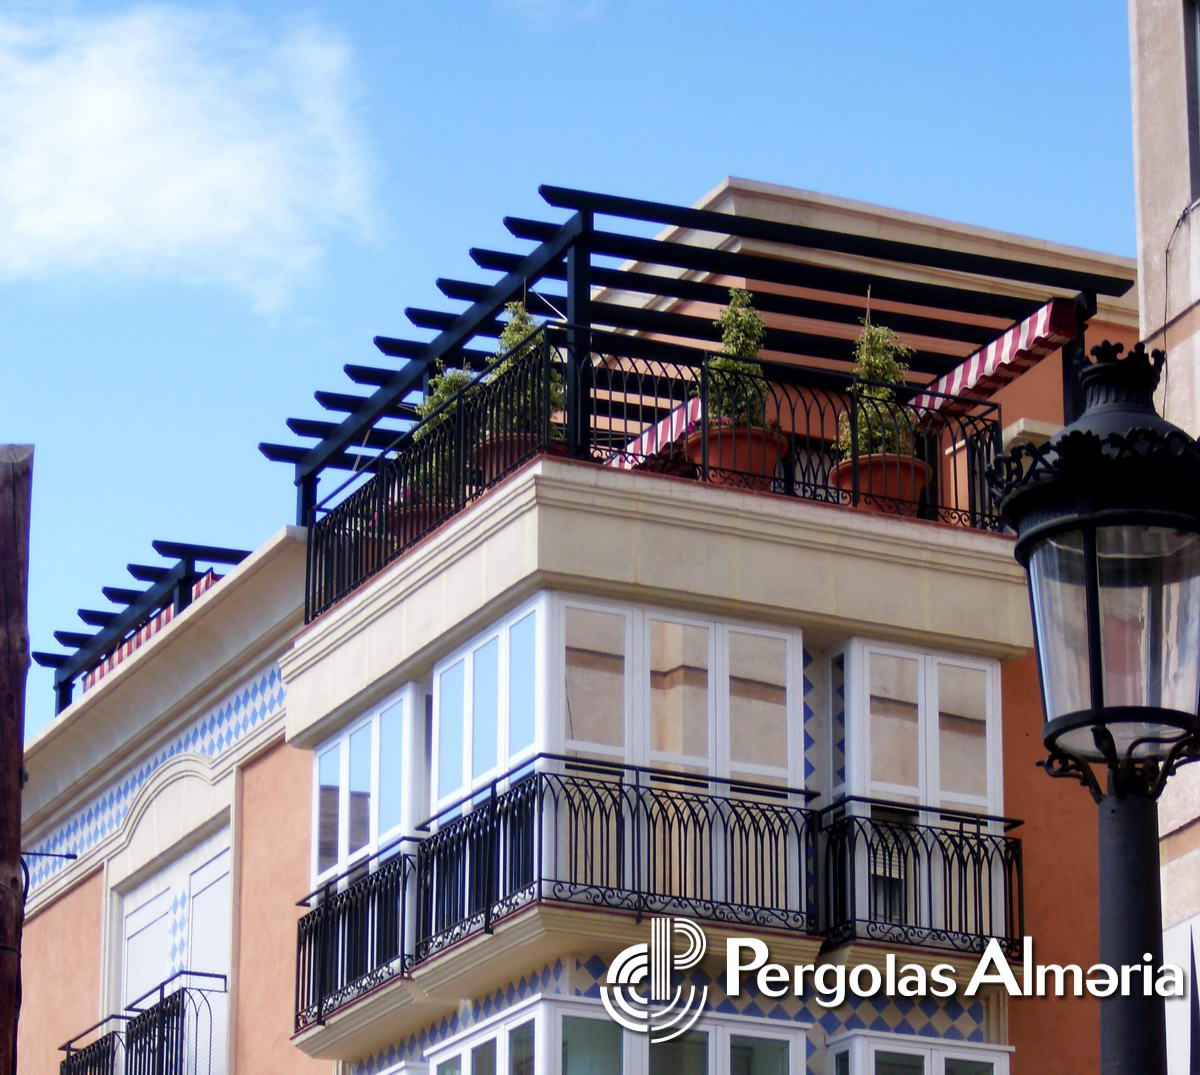 P rgolas minimalistas - Toldos pergolas para terrazas ...